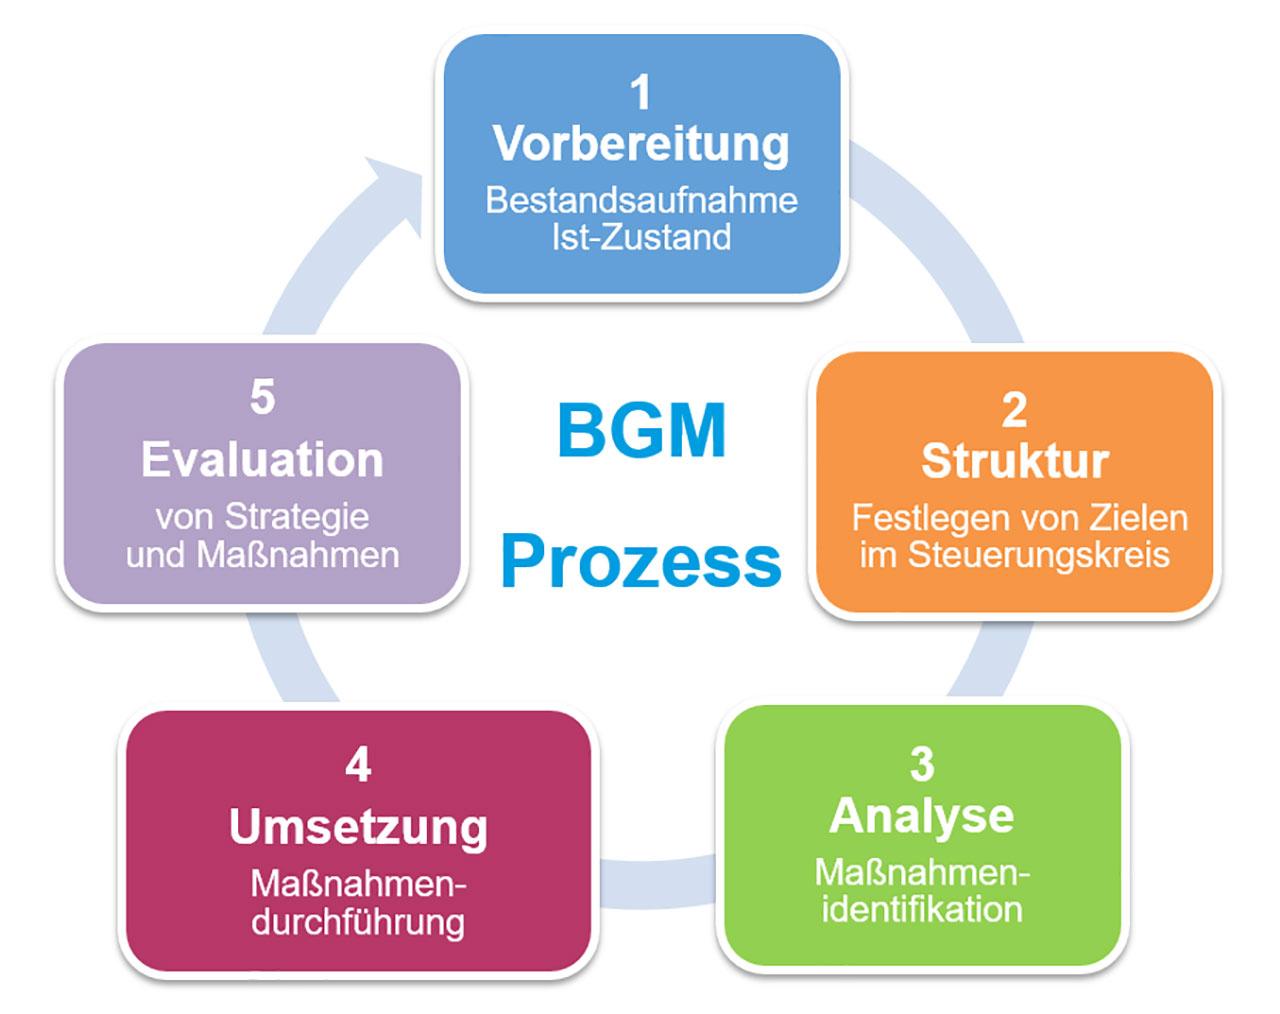 BGM - Prozess